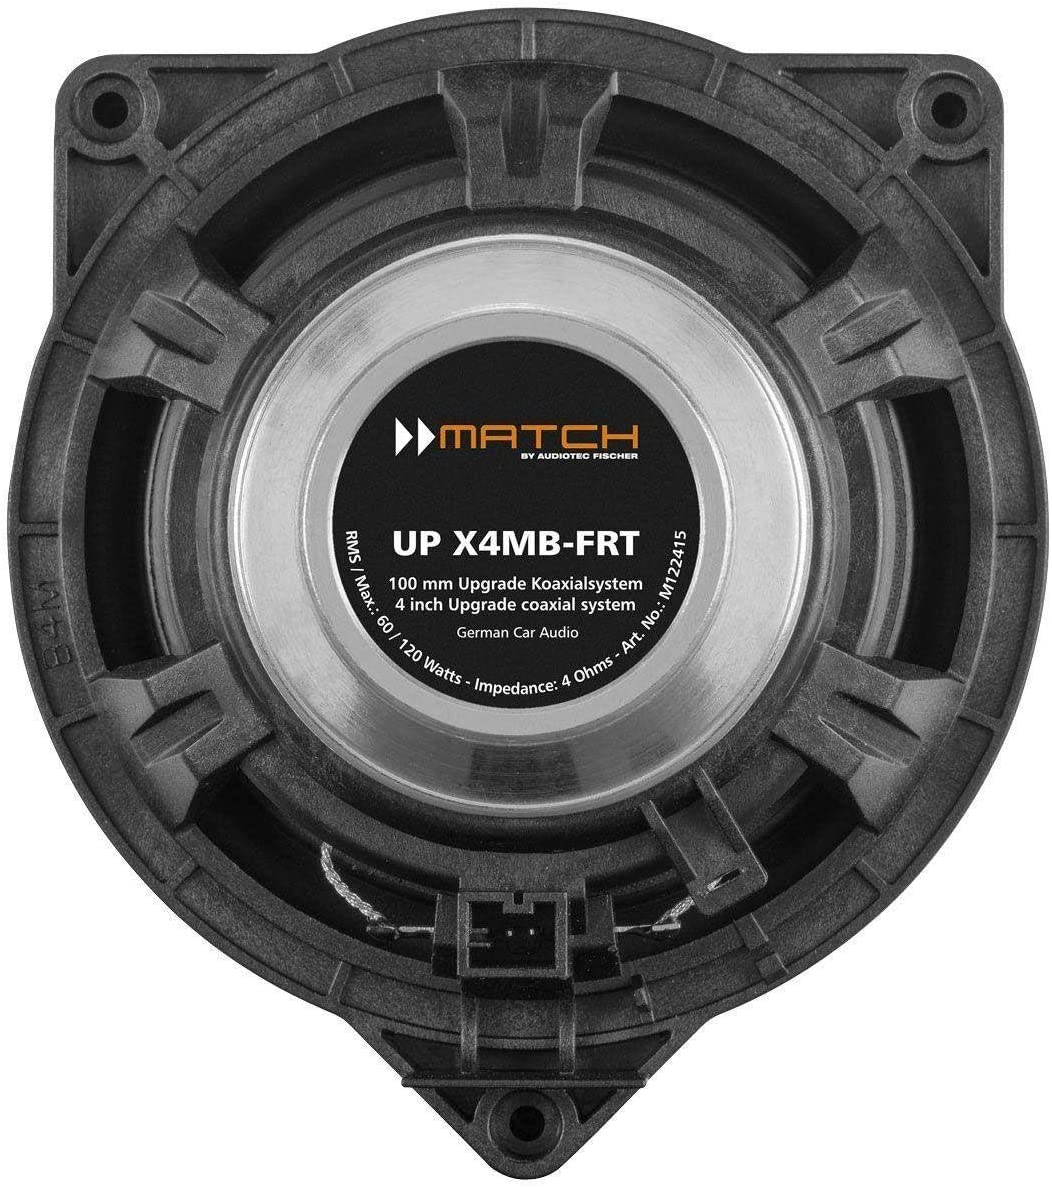 Helix Up X4mb Frt 2 Wege Koax Lautsprecher System Tür Front Heck Für Mercedes Z B C Klasse E Klasse Usw Navigation